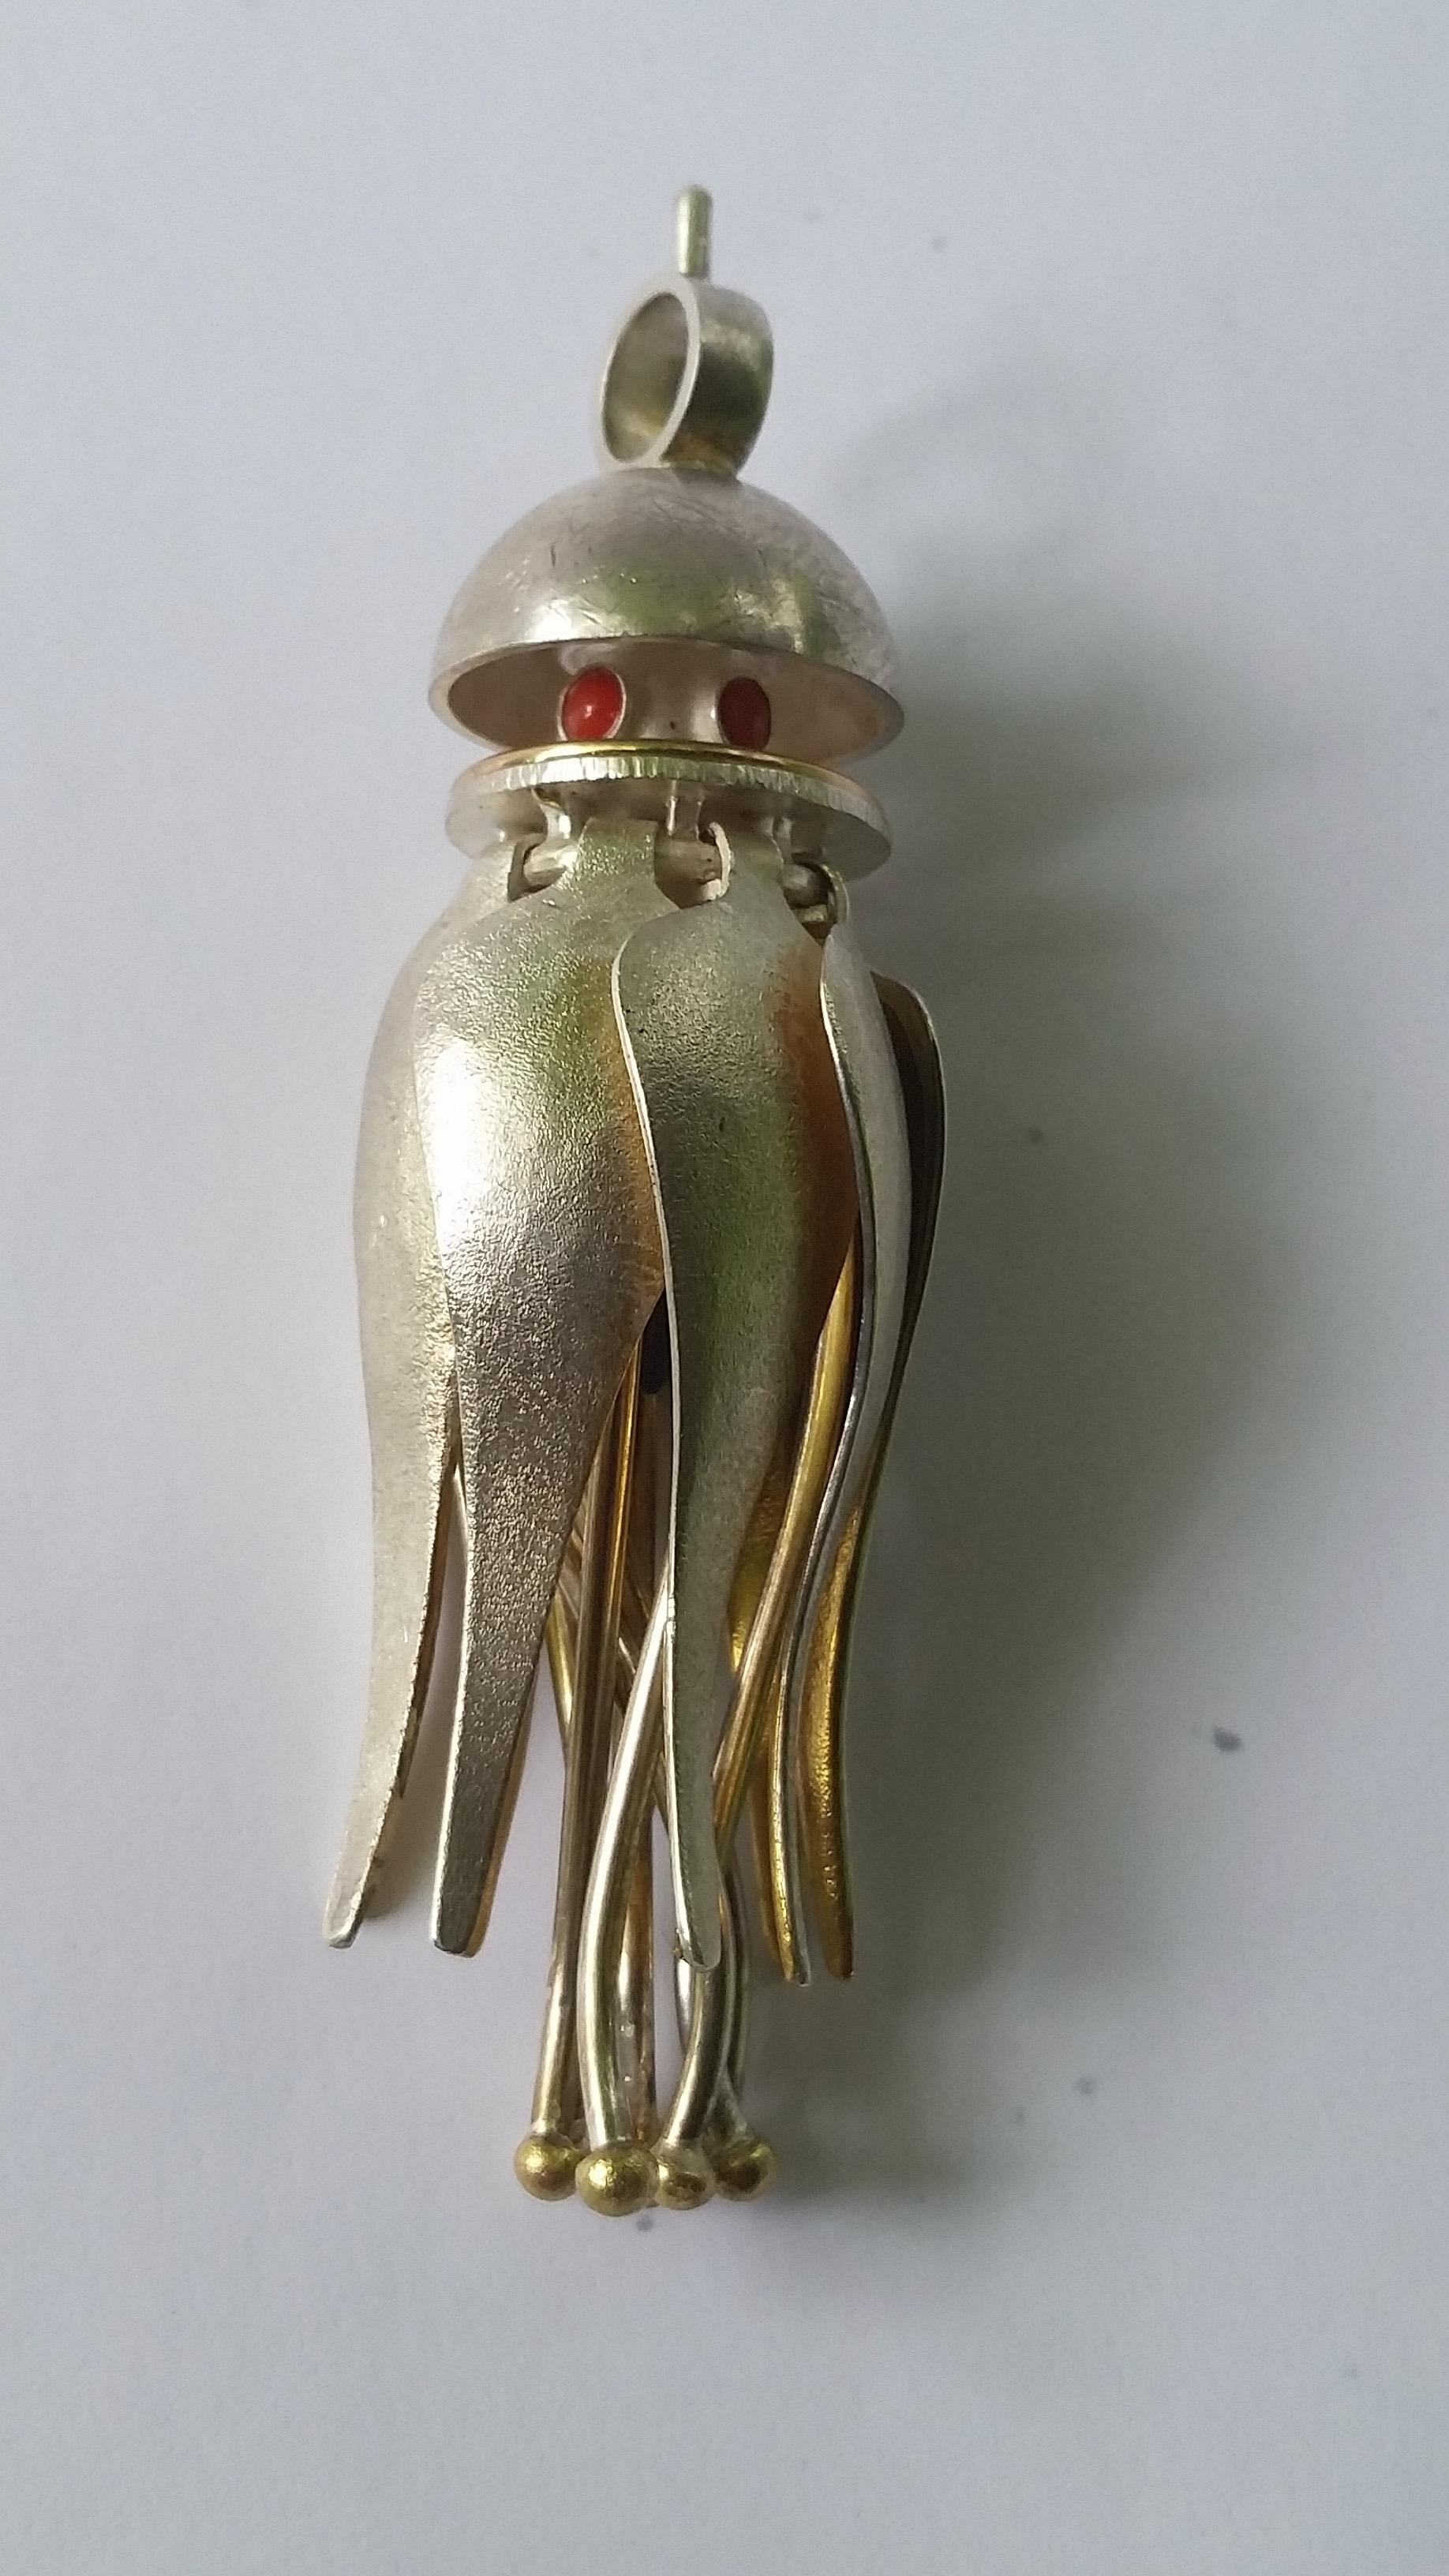 #6a.jpg   pendant (closed) 2.5 cm w, 2.5 cm d, 8 cm h.jpg